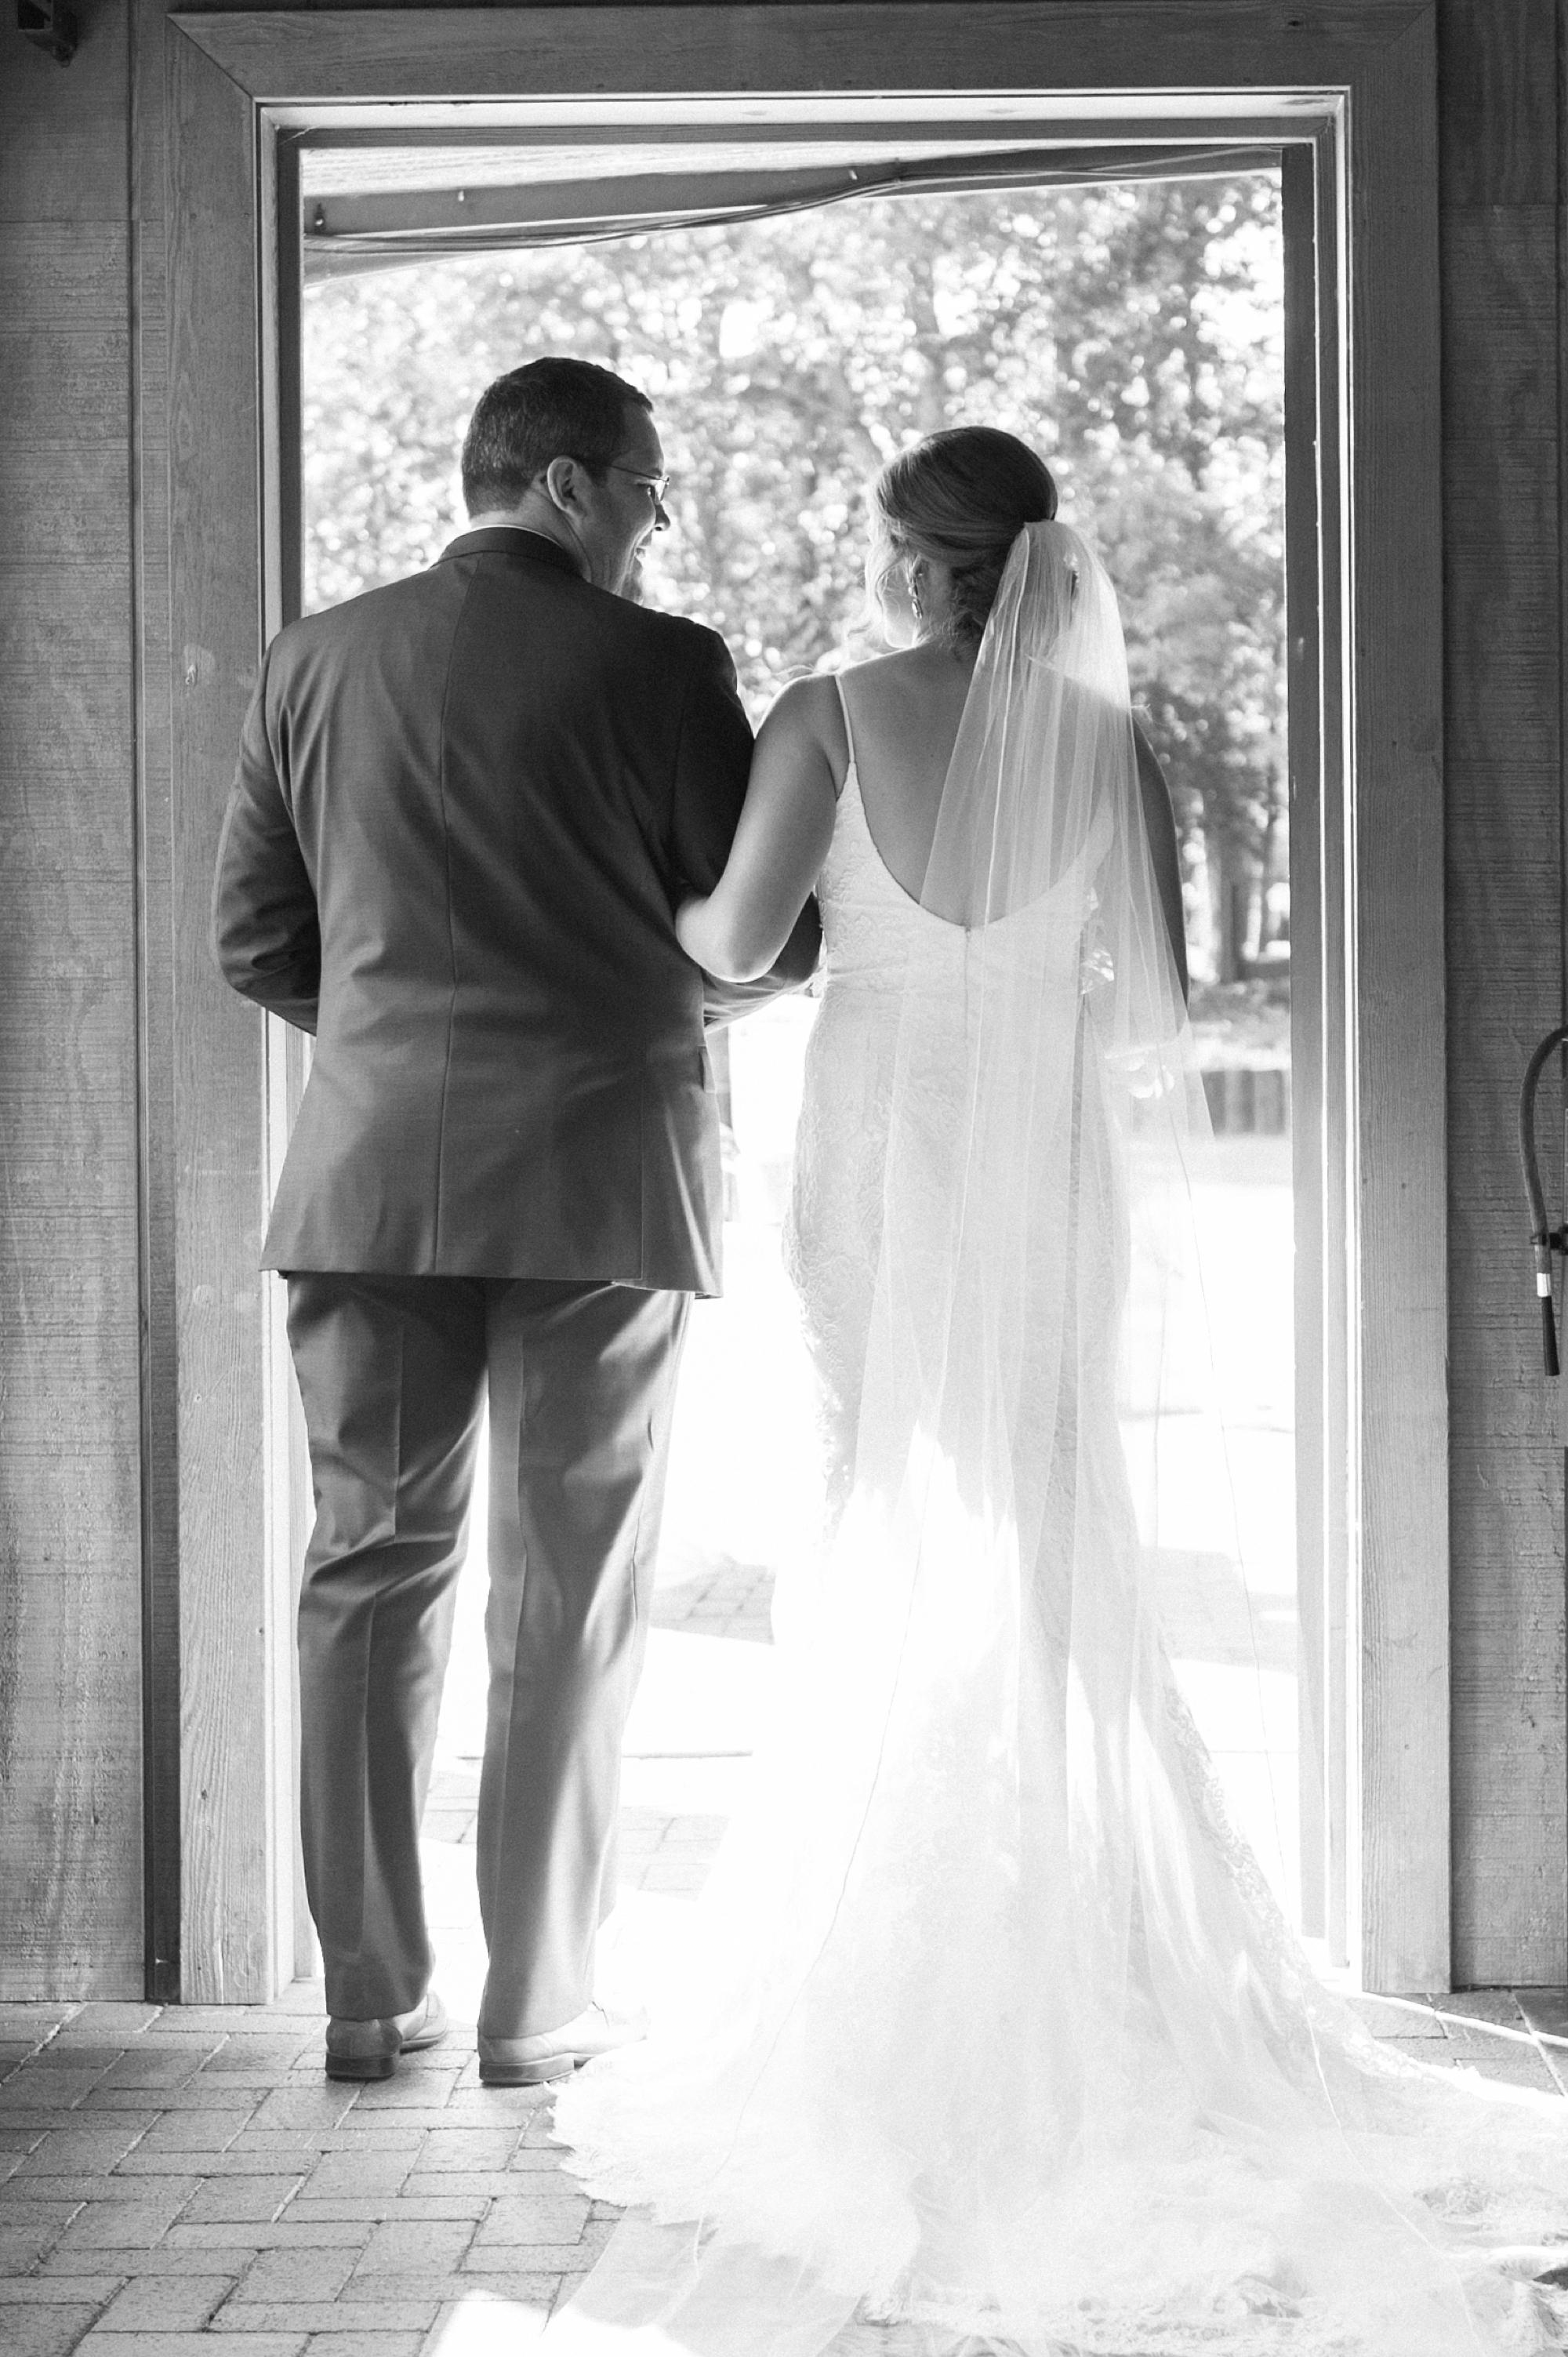 Angus-Barn-Pavilion-Raleigh-Wedding-Film-Photographer_0152.jpg